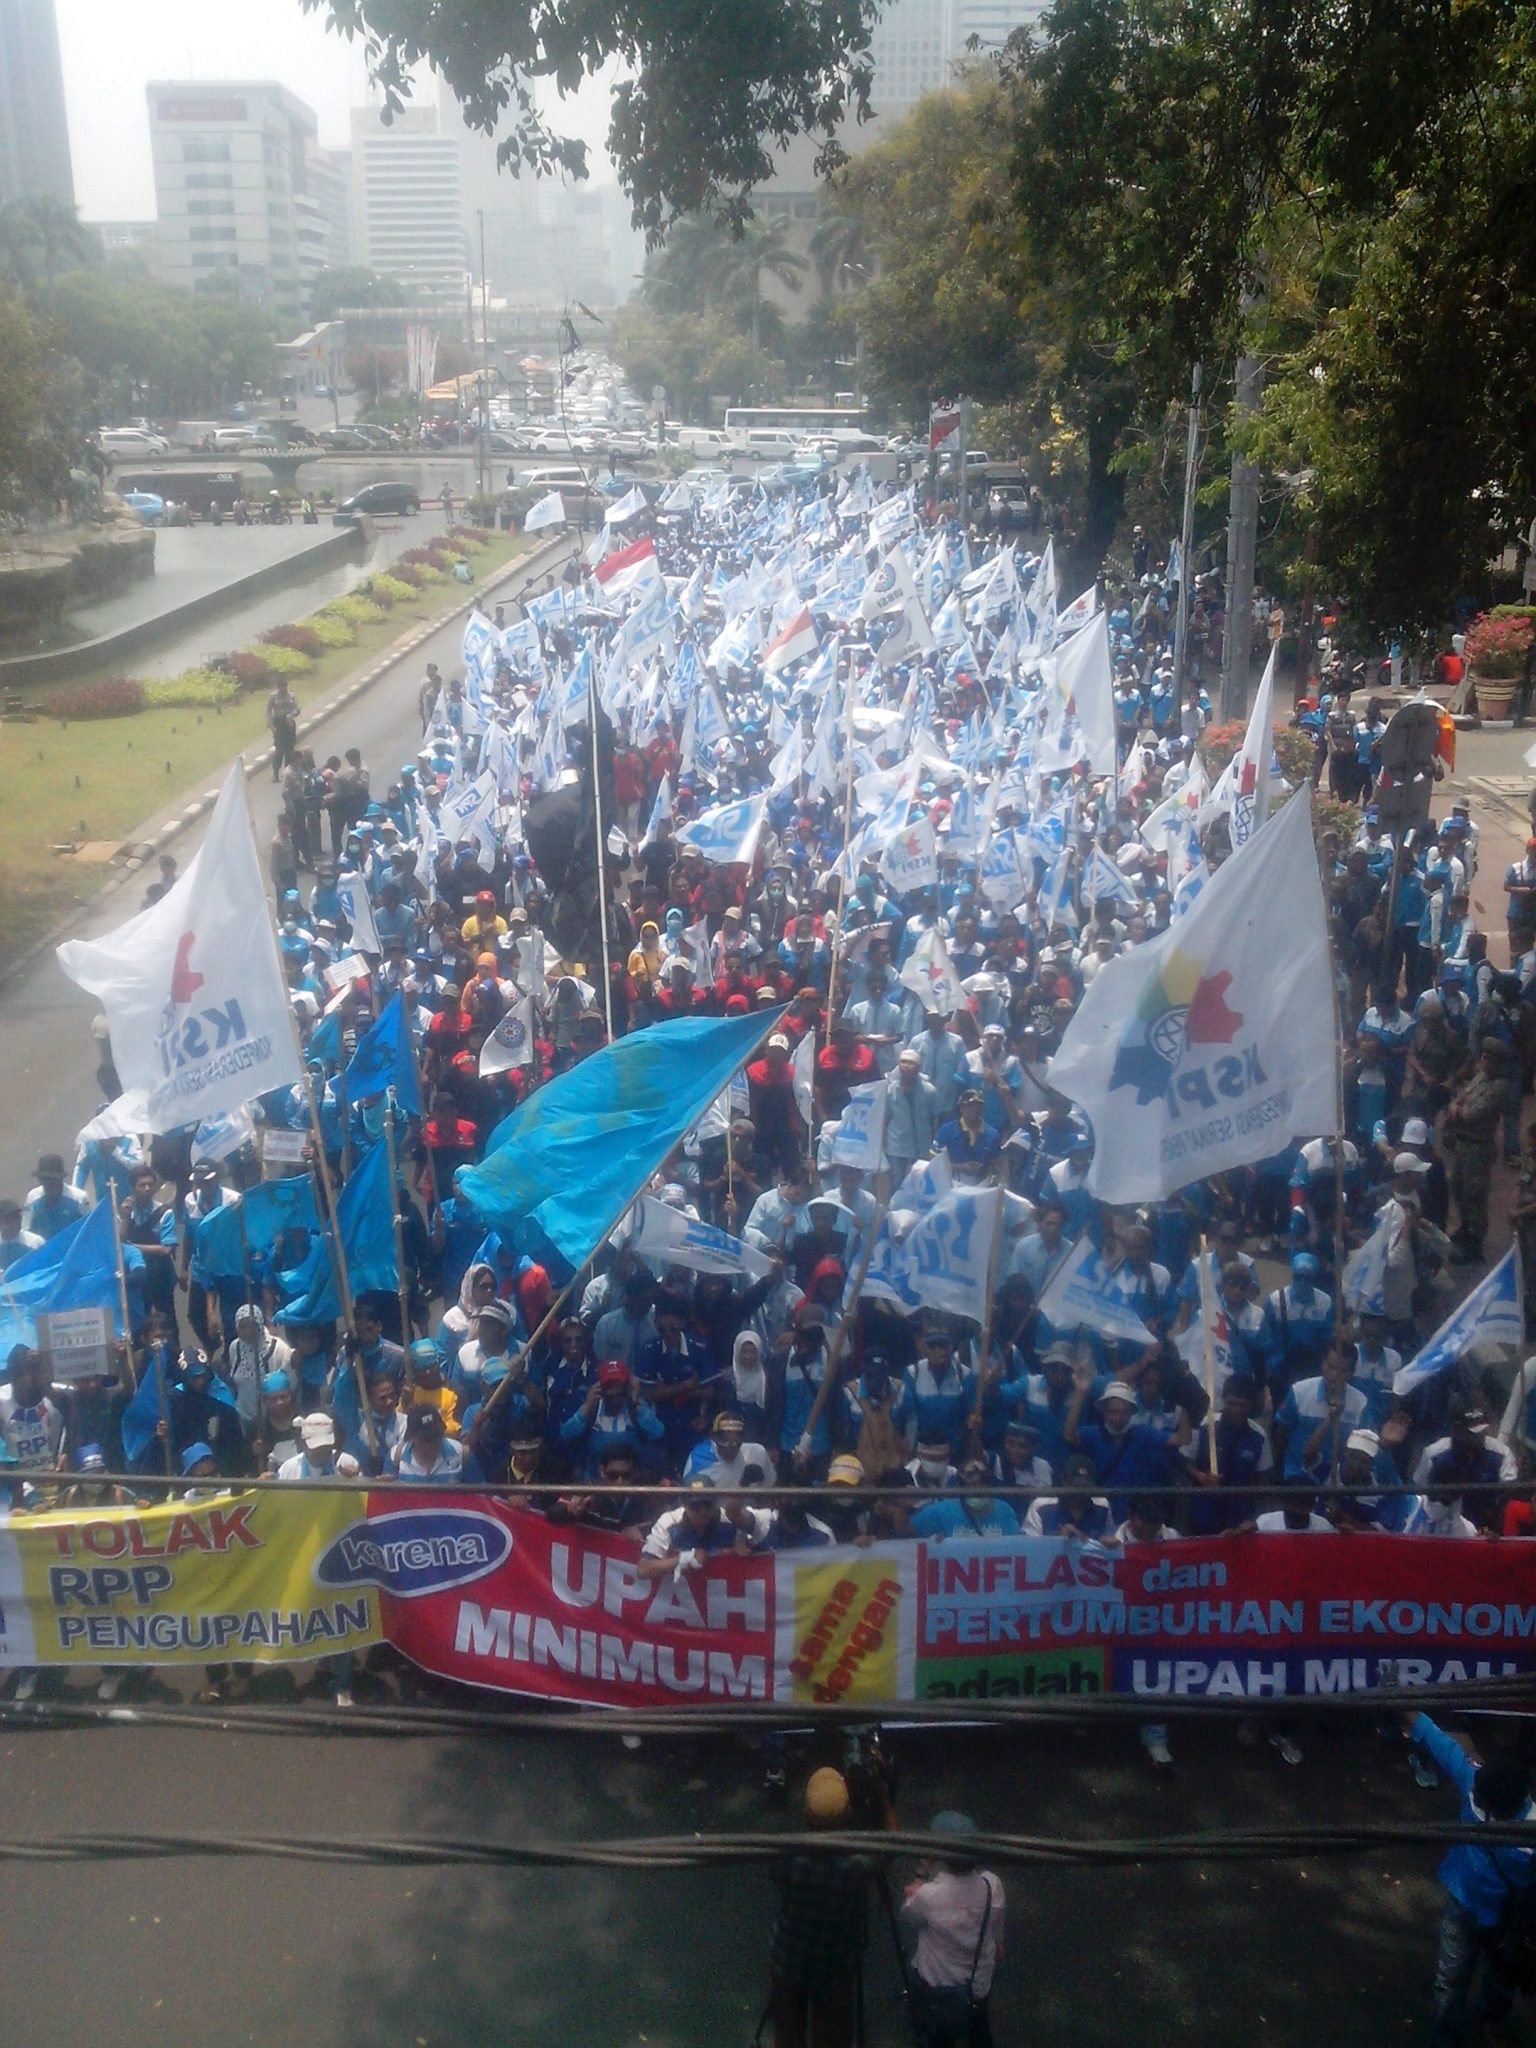 Aksi demonstrasi sebagai perwujudan komitmen (KOMITMEN)